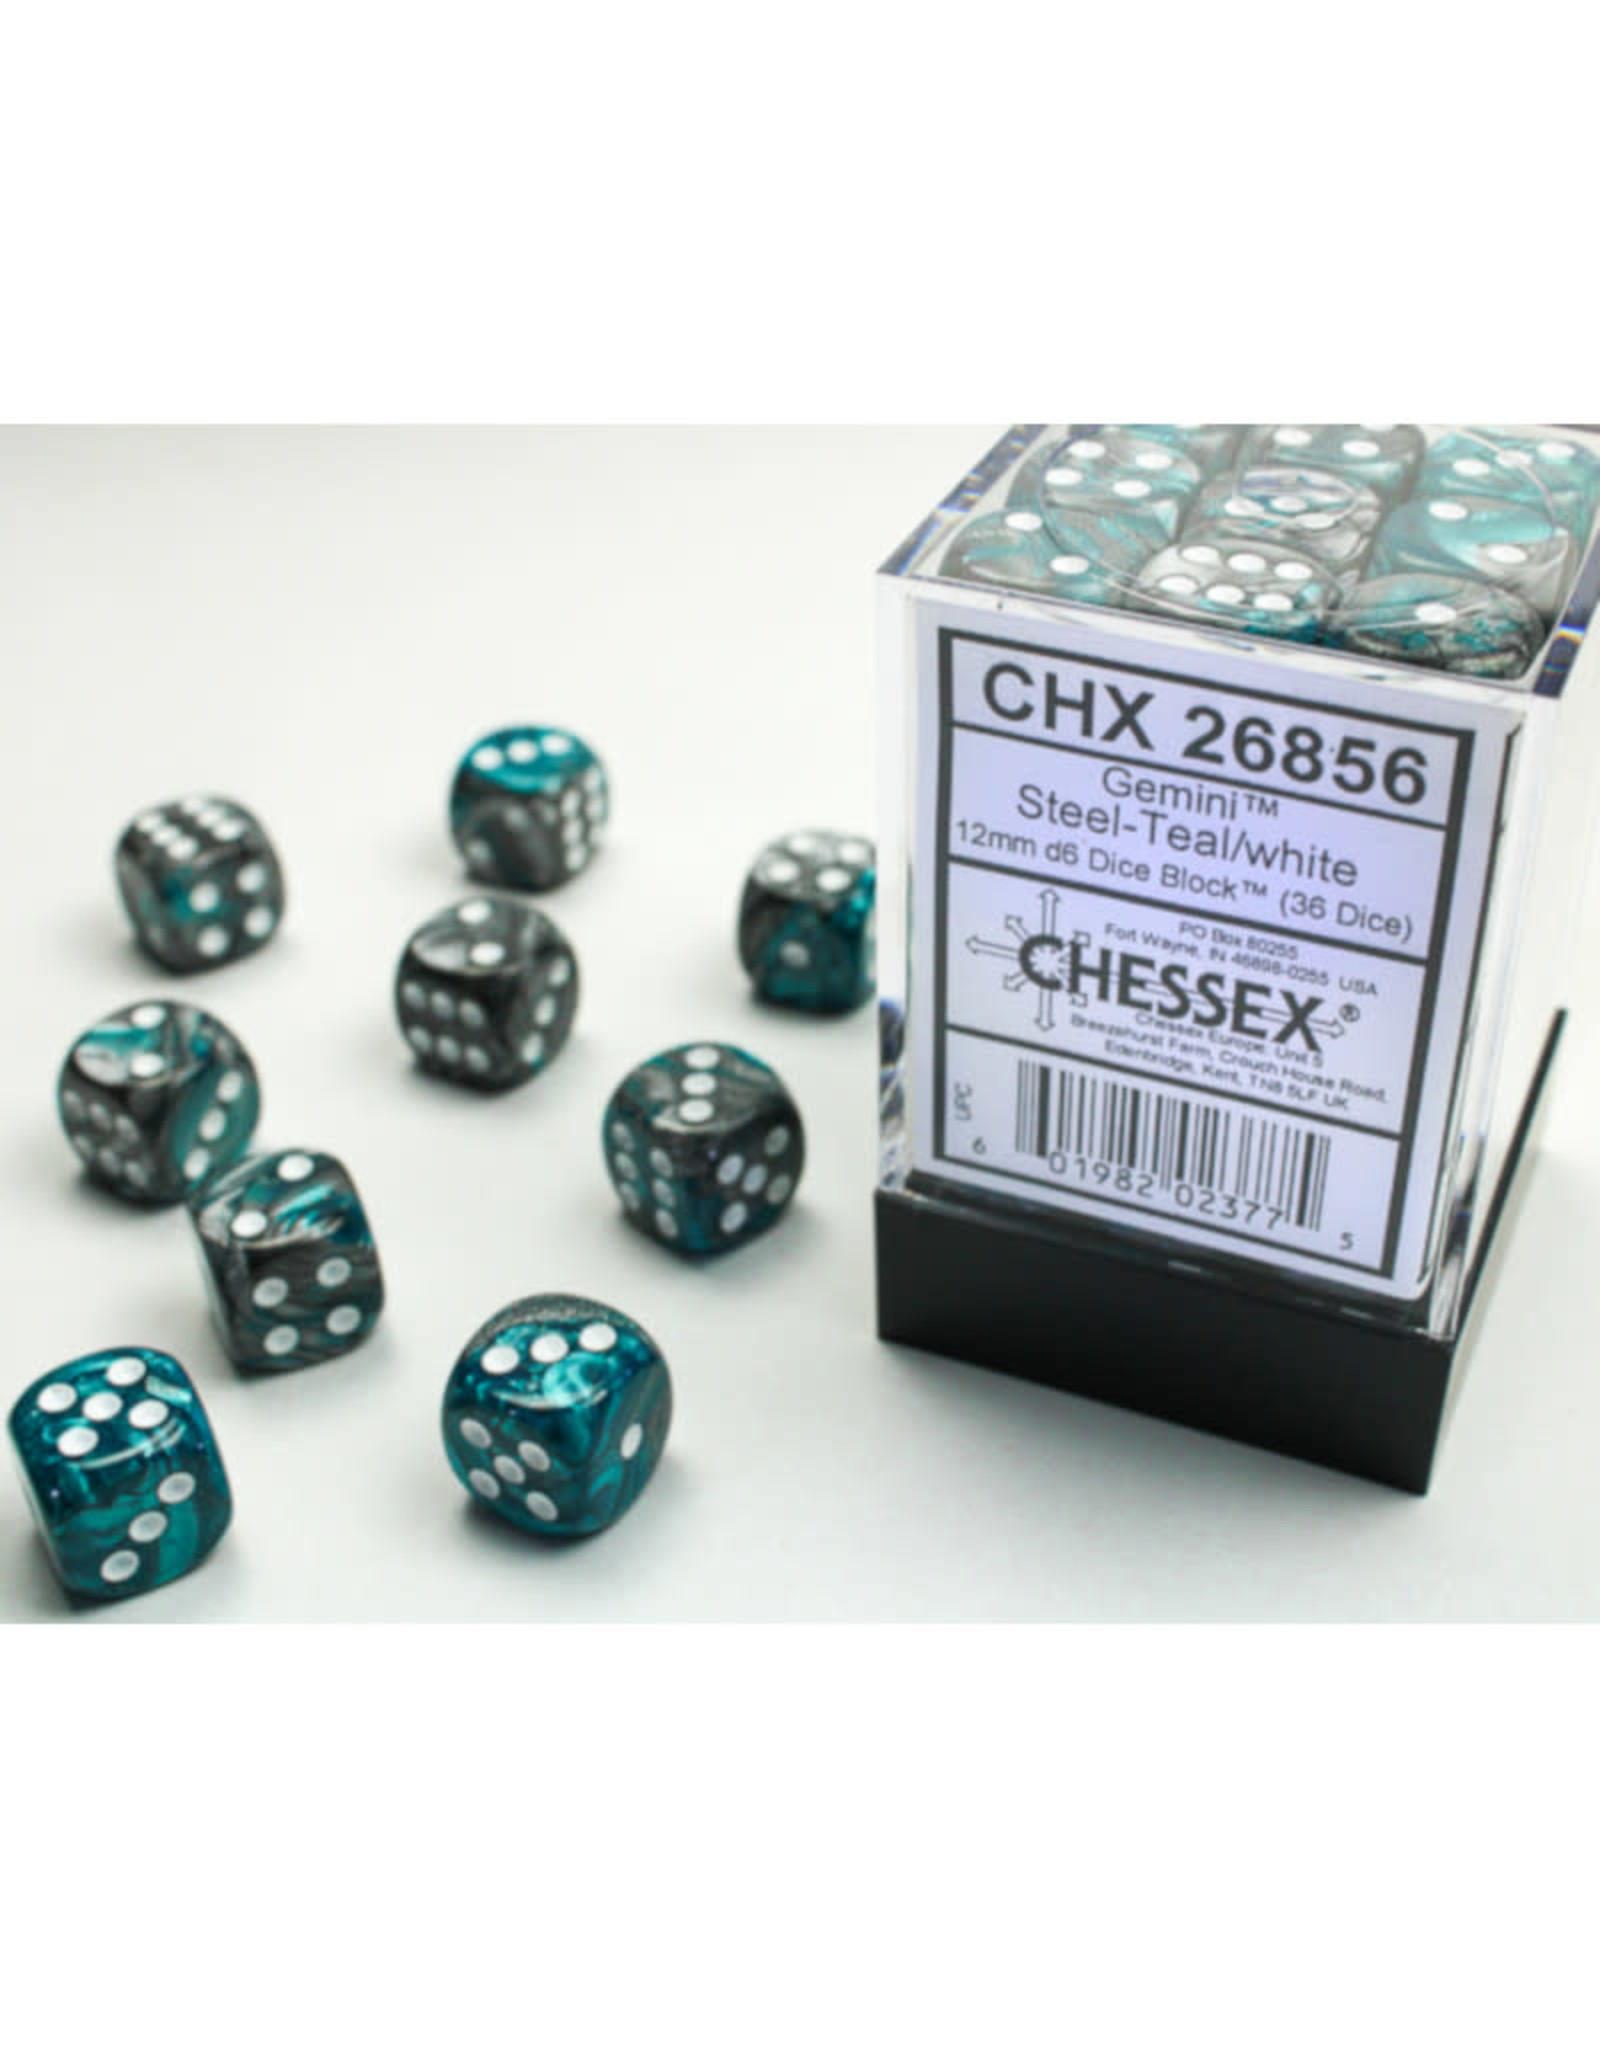 Chessex D6 Dice: 12mm Gemini Steel Teal/White (36)